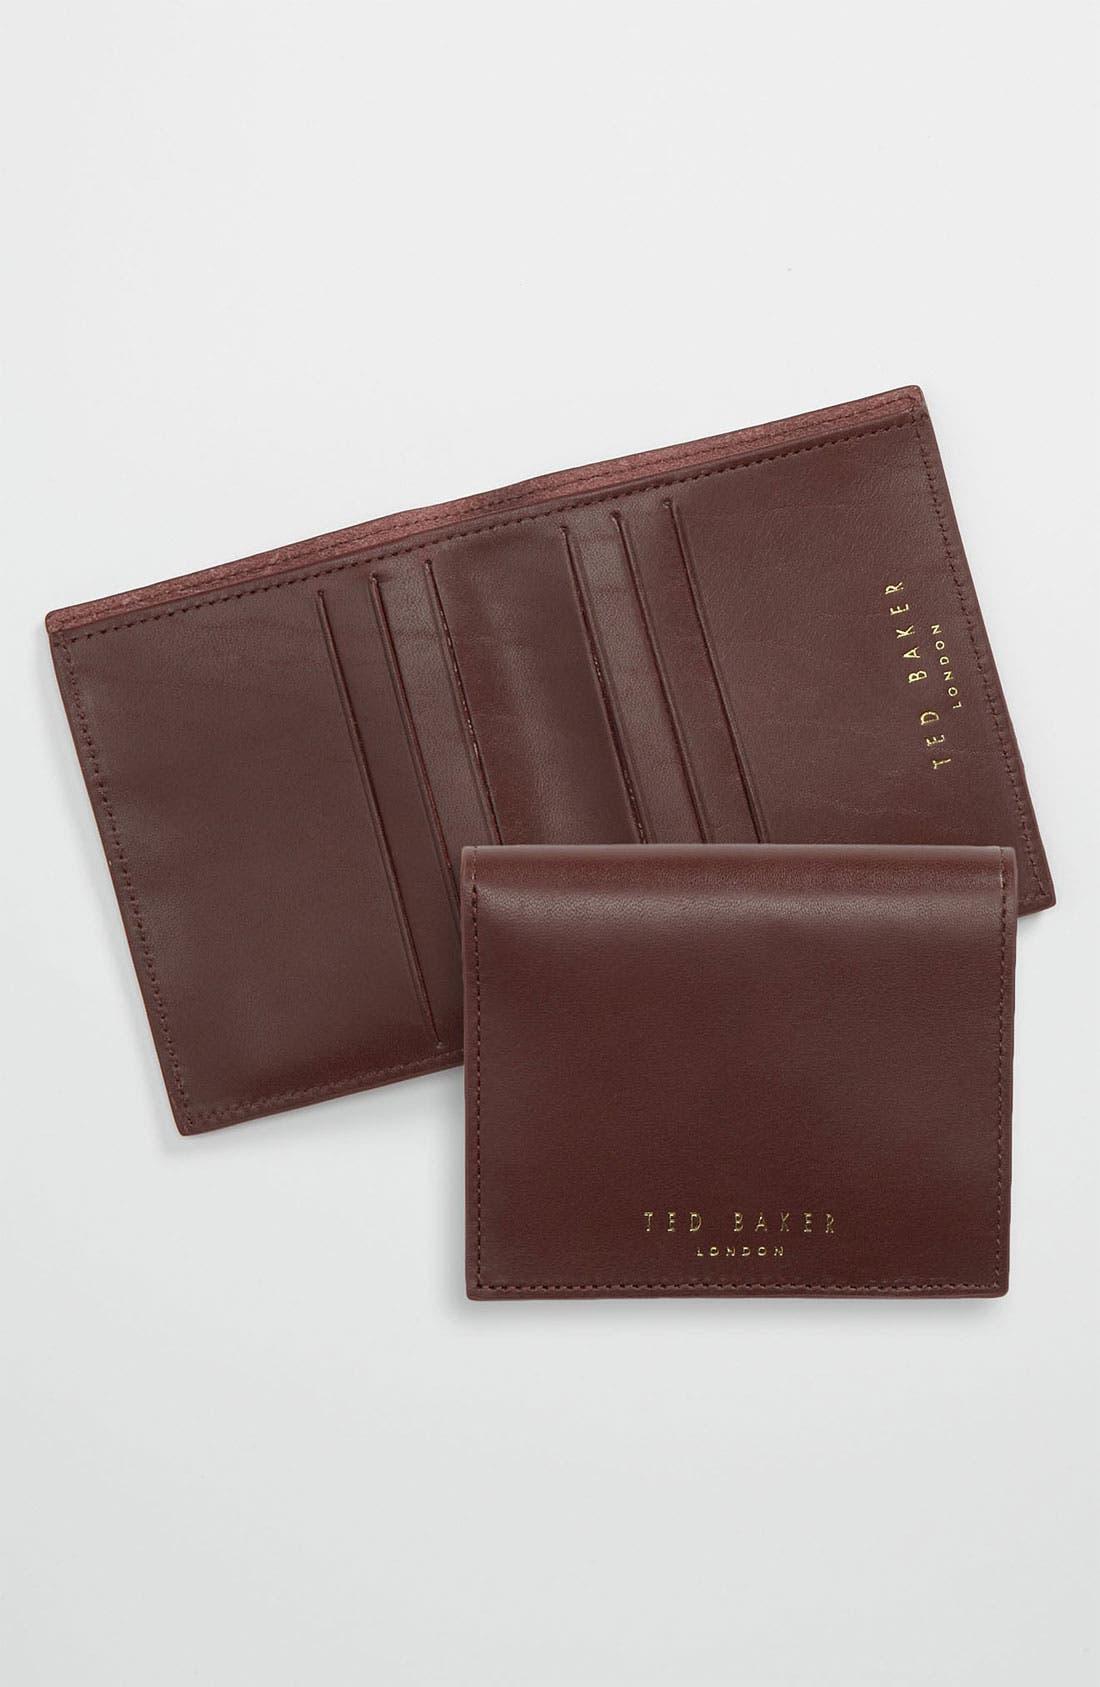 Alternate Image 1 Selected - Ted Baker London 'Tellaw' Wallet